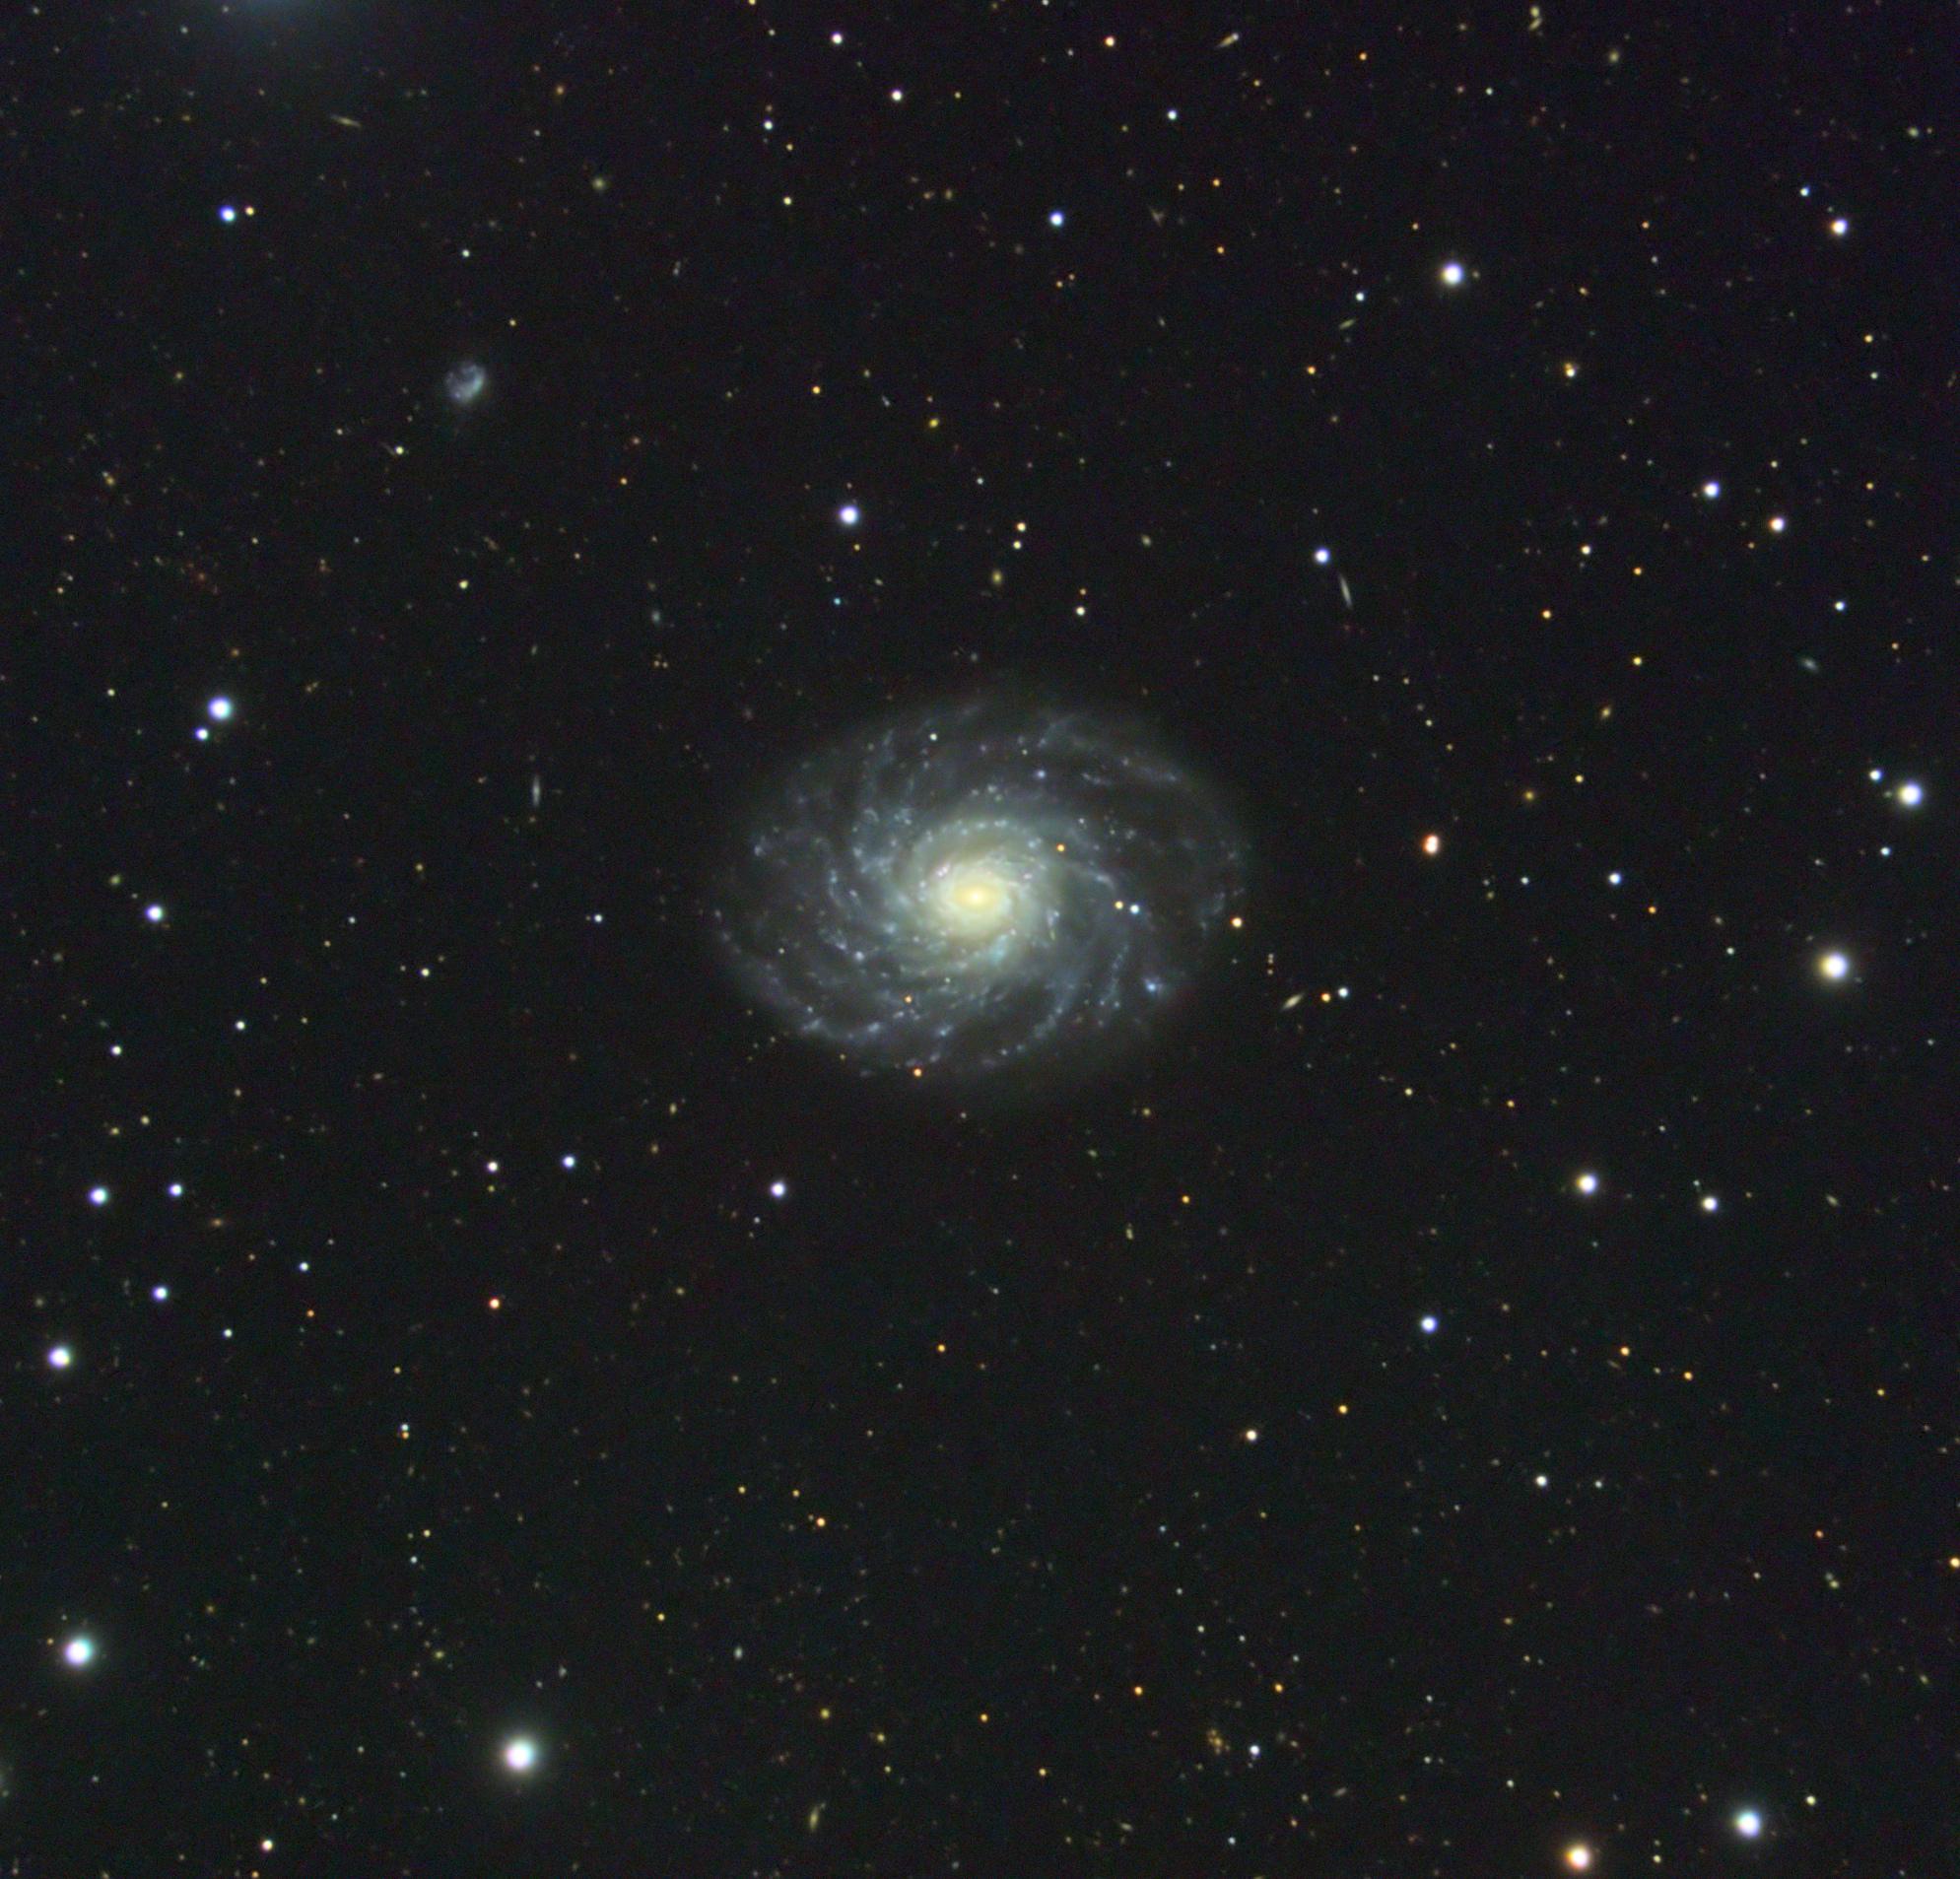 NGC_3486_X1_aHL_RGB_TB.jpg.1e751972ffb5c655b63d623030c82019.jpg